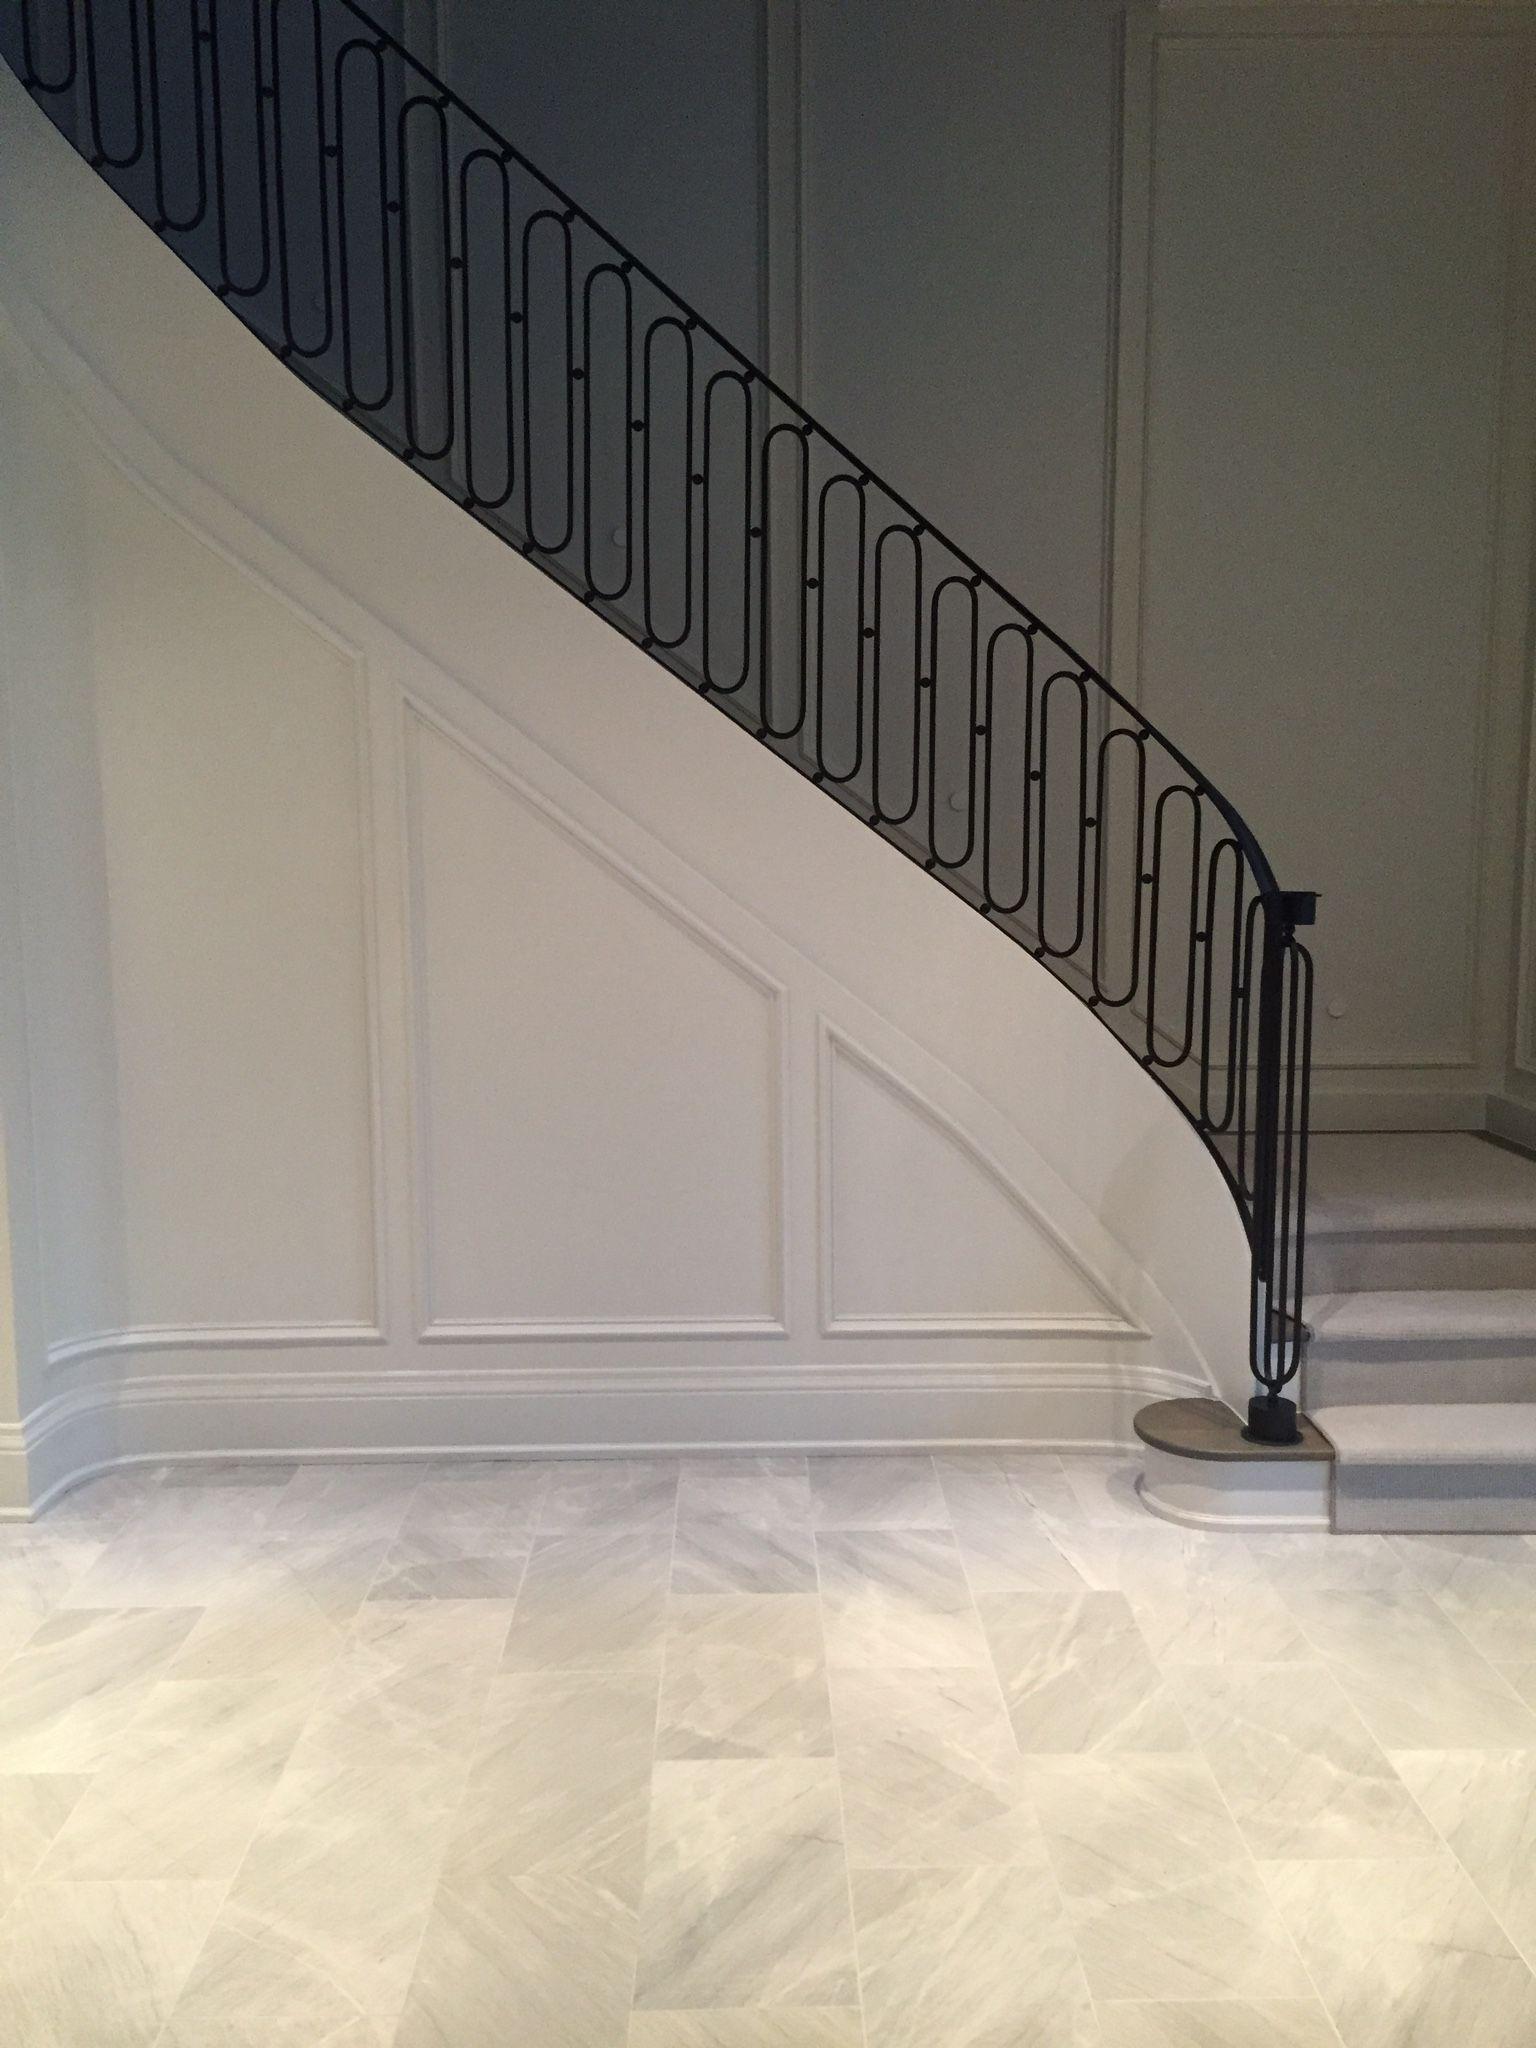 Paint trim same as walls interior railing stairs - Contemporary stair railings interior photos ...